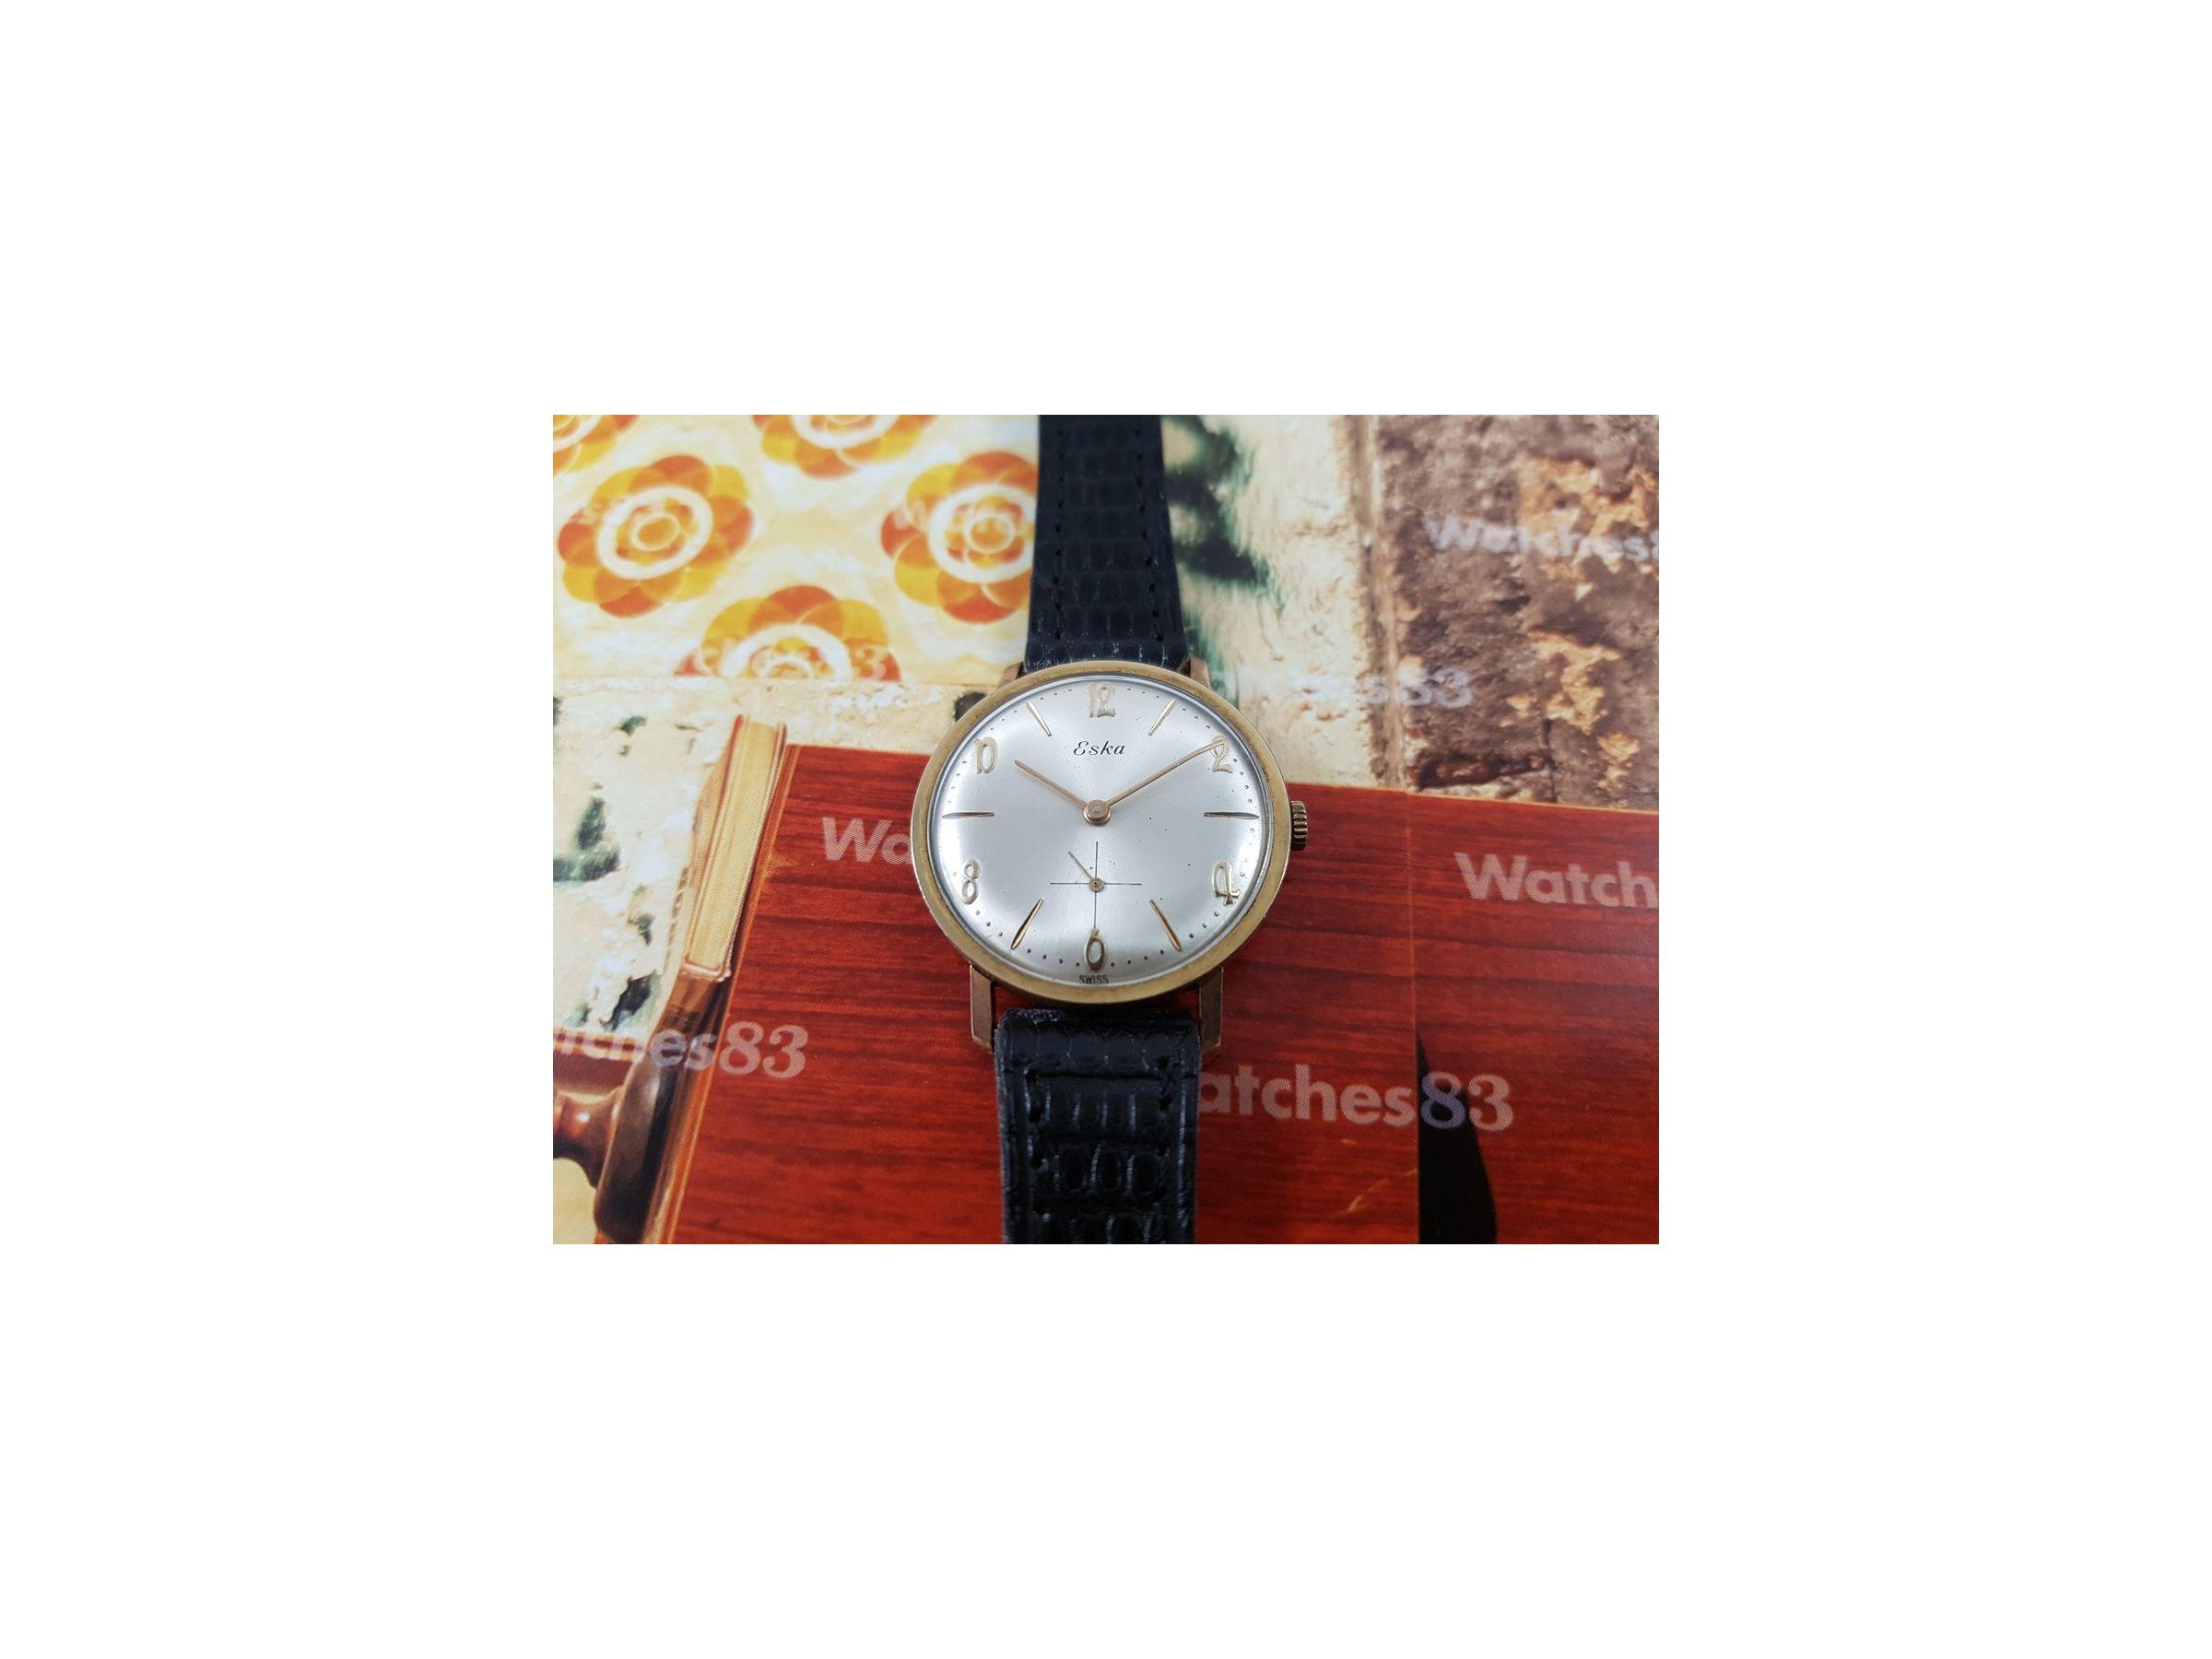 eska Array - vintage manual winding swiss watch eska plaqu or eska vintage  rh watches83 com